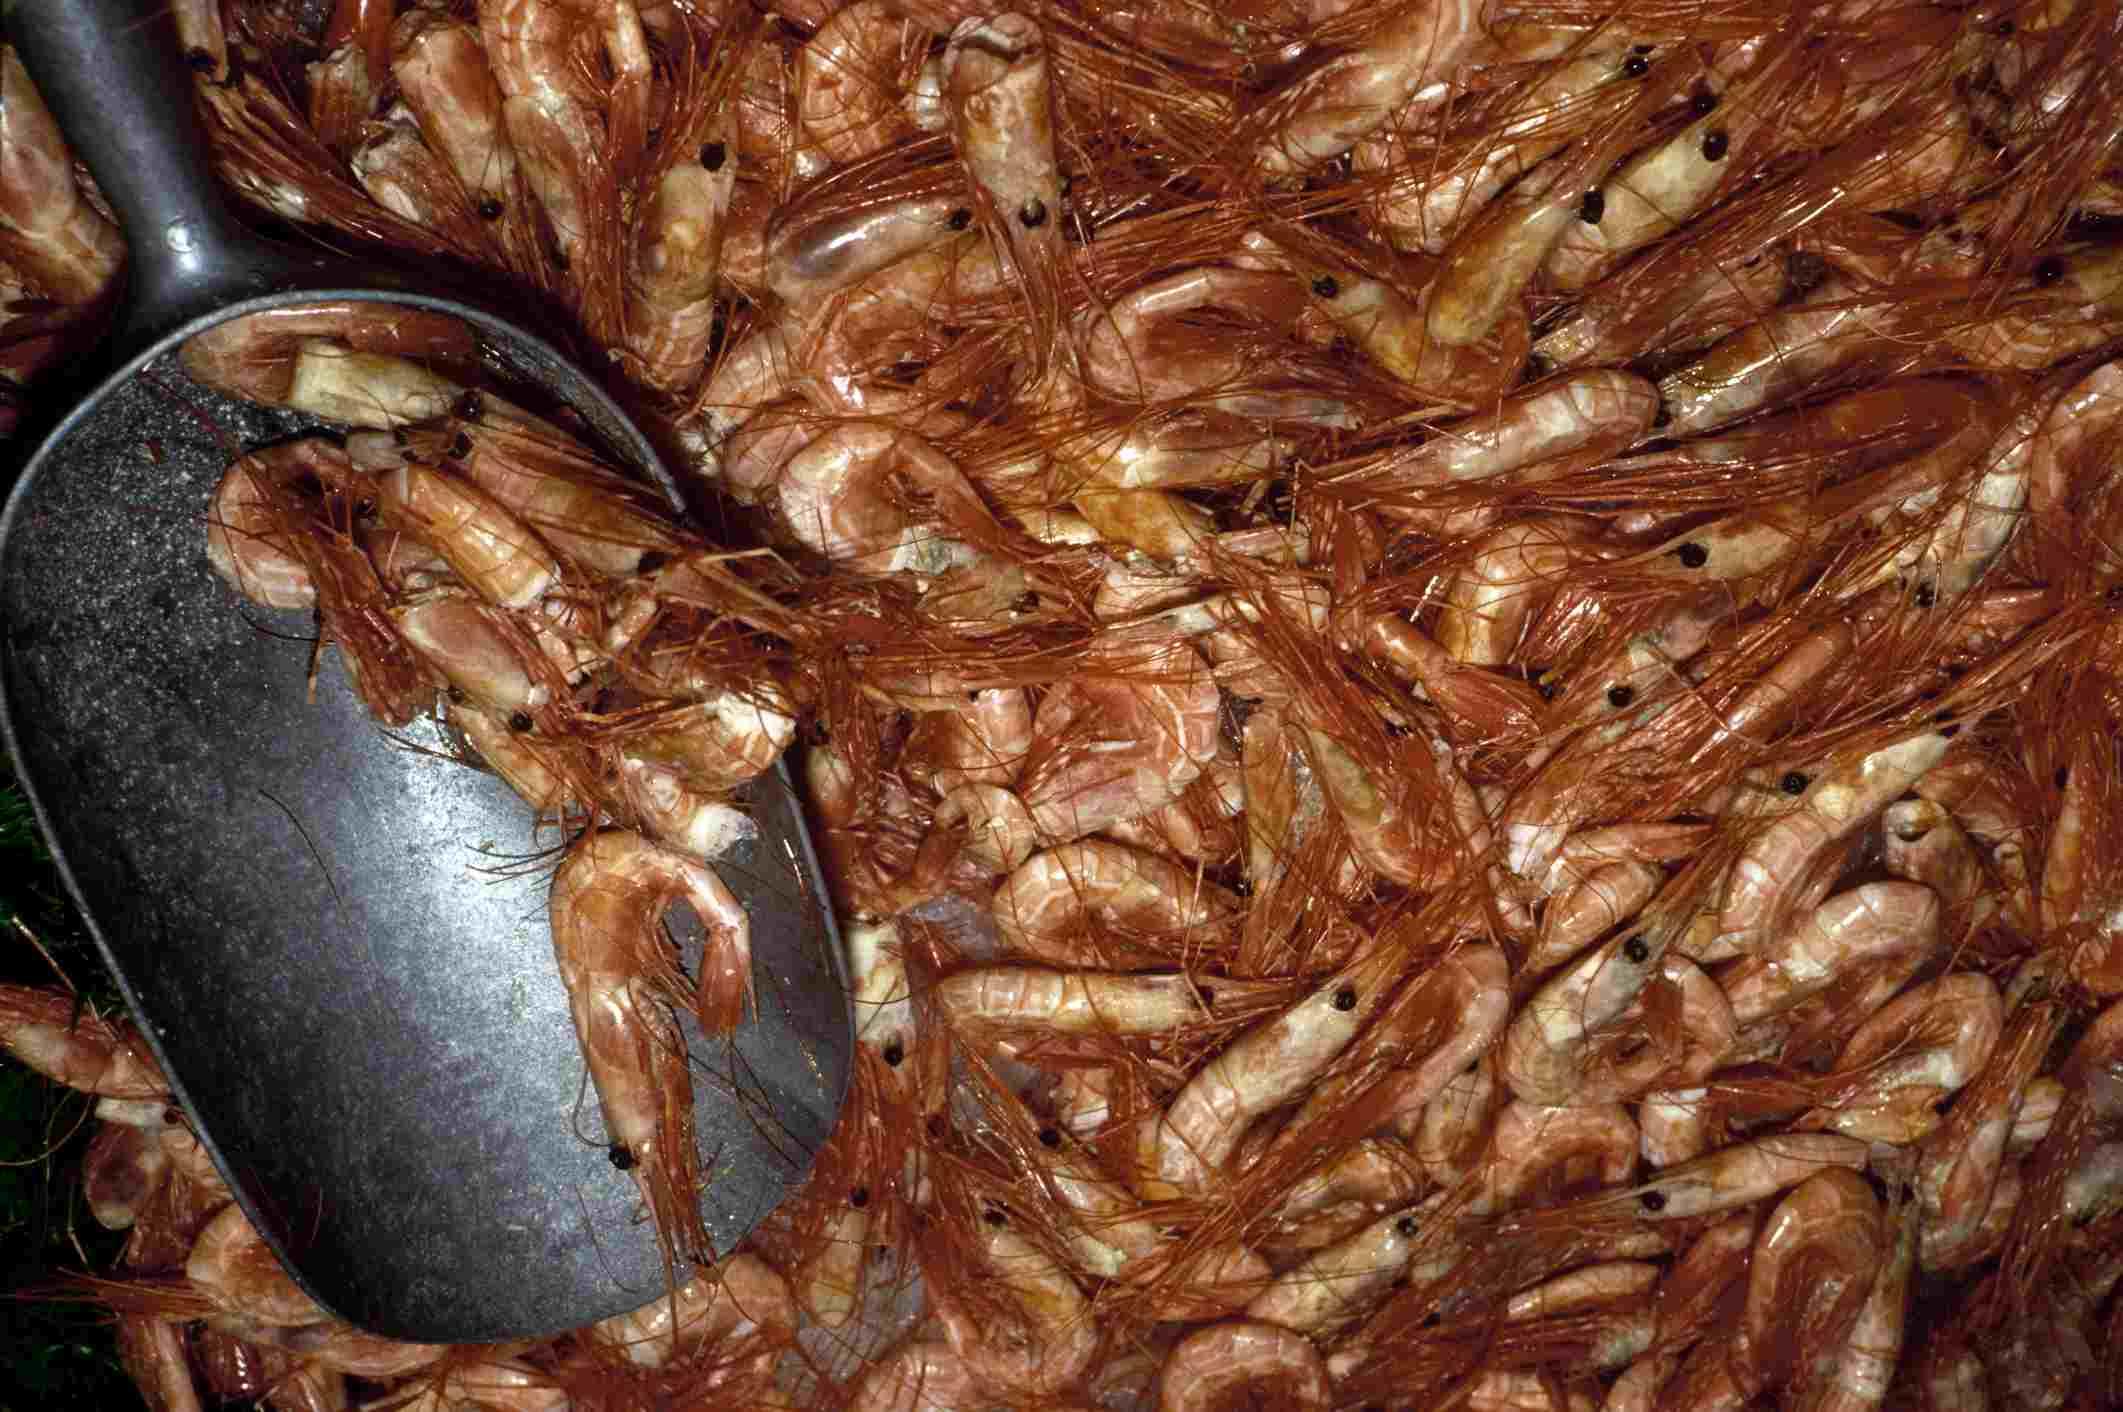 Fresh Florida shrimp